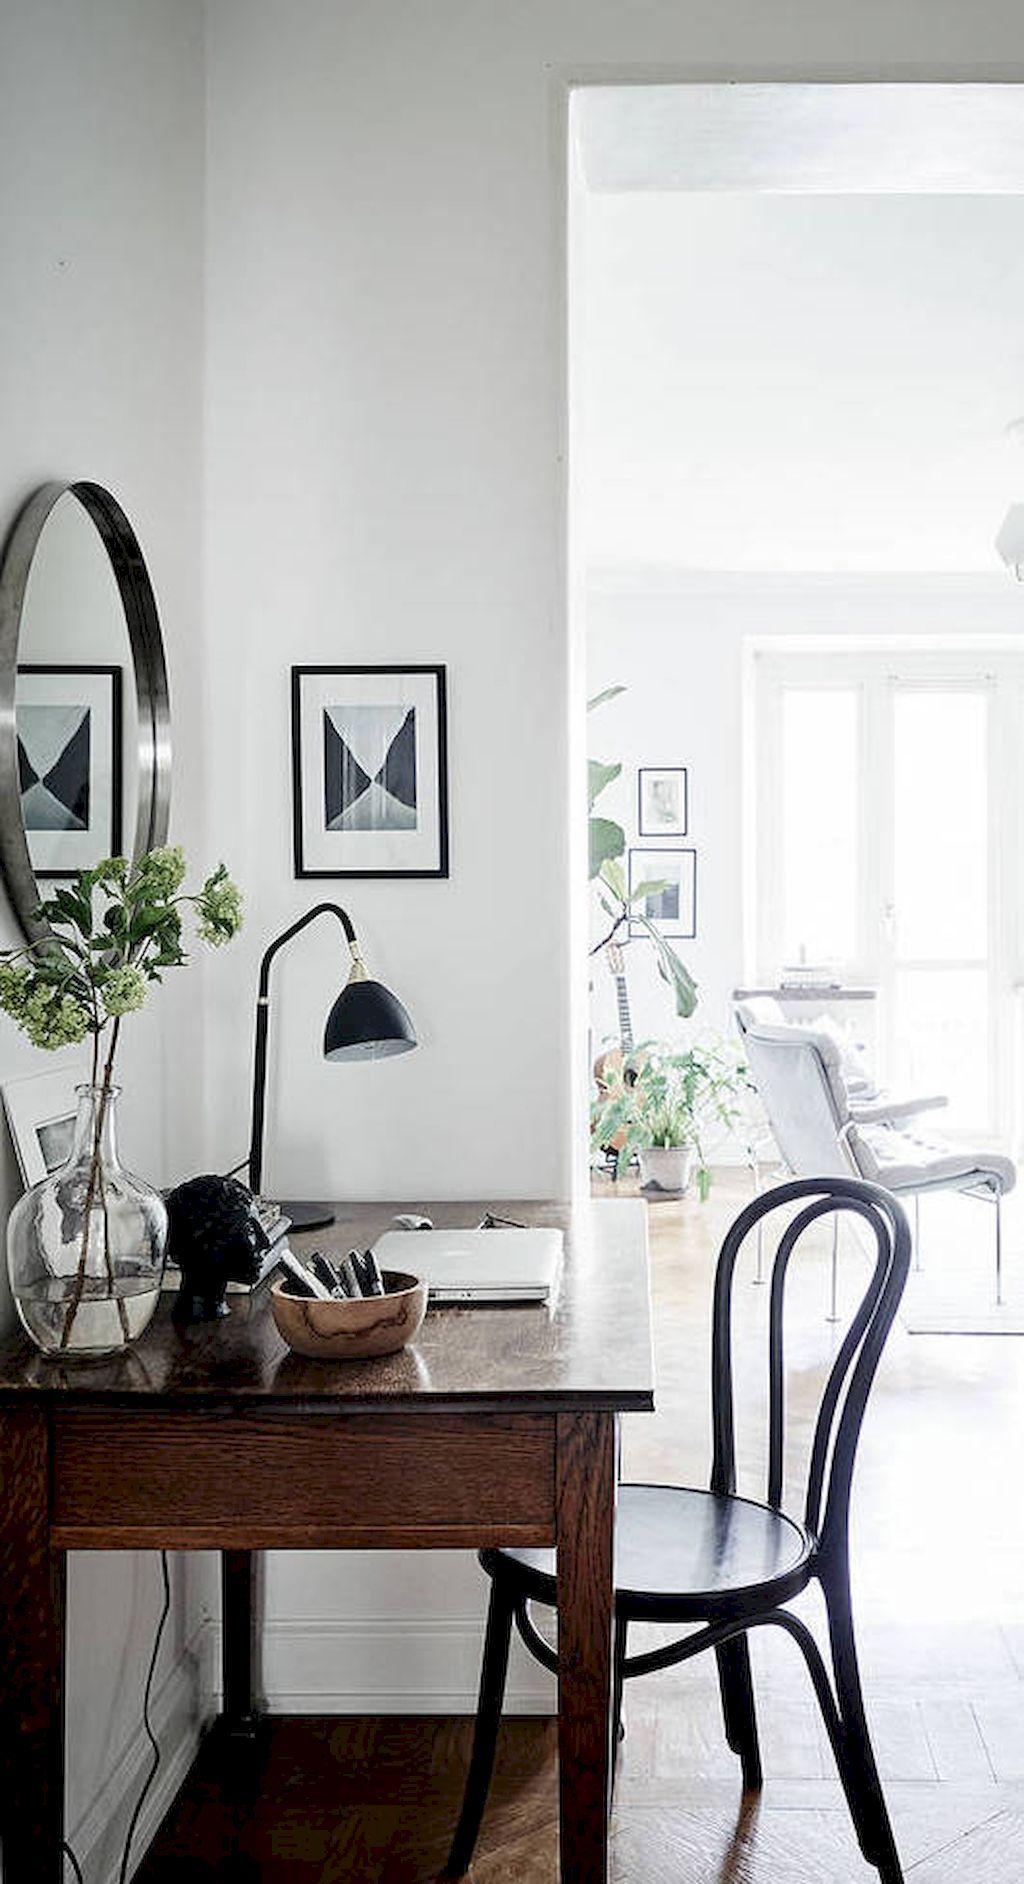 80 Minimalist Apartment Home Decor Ideas | Apartments decorating ...